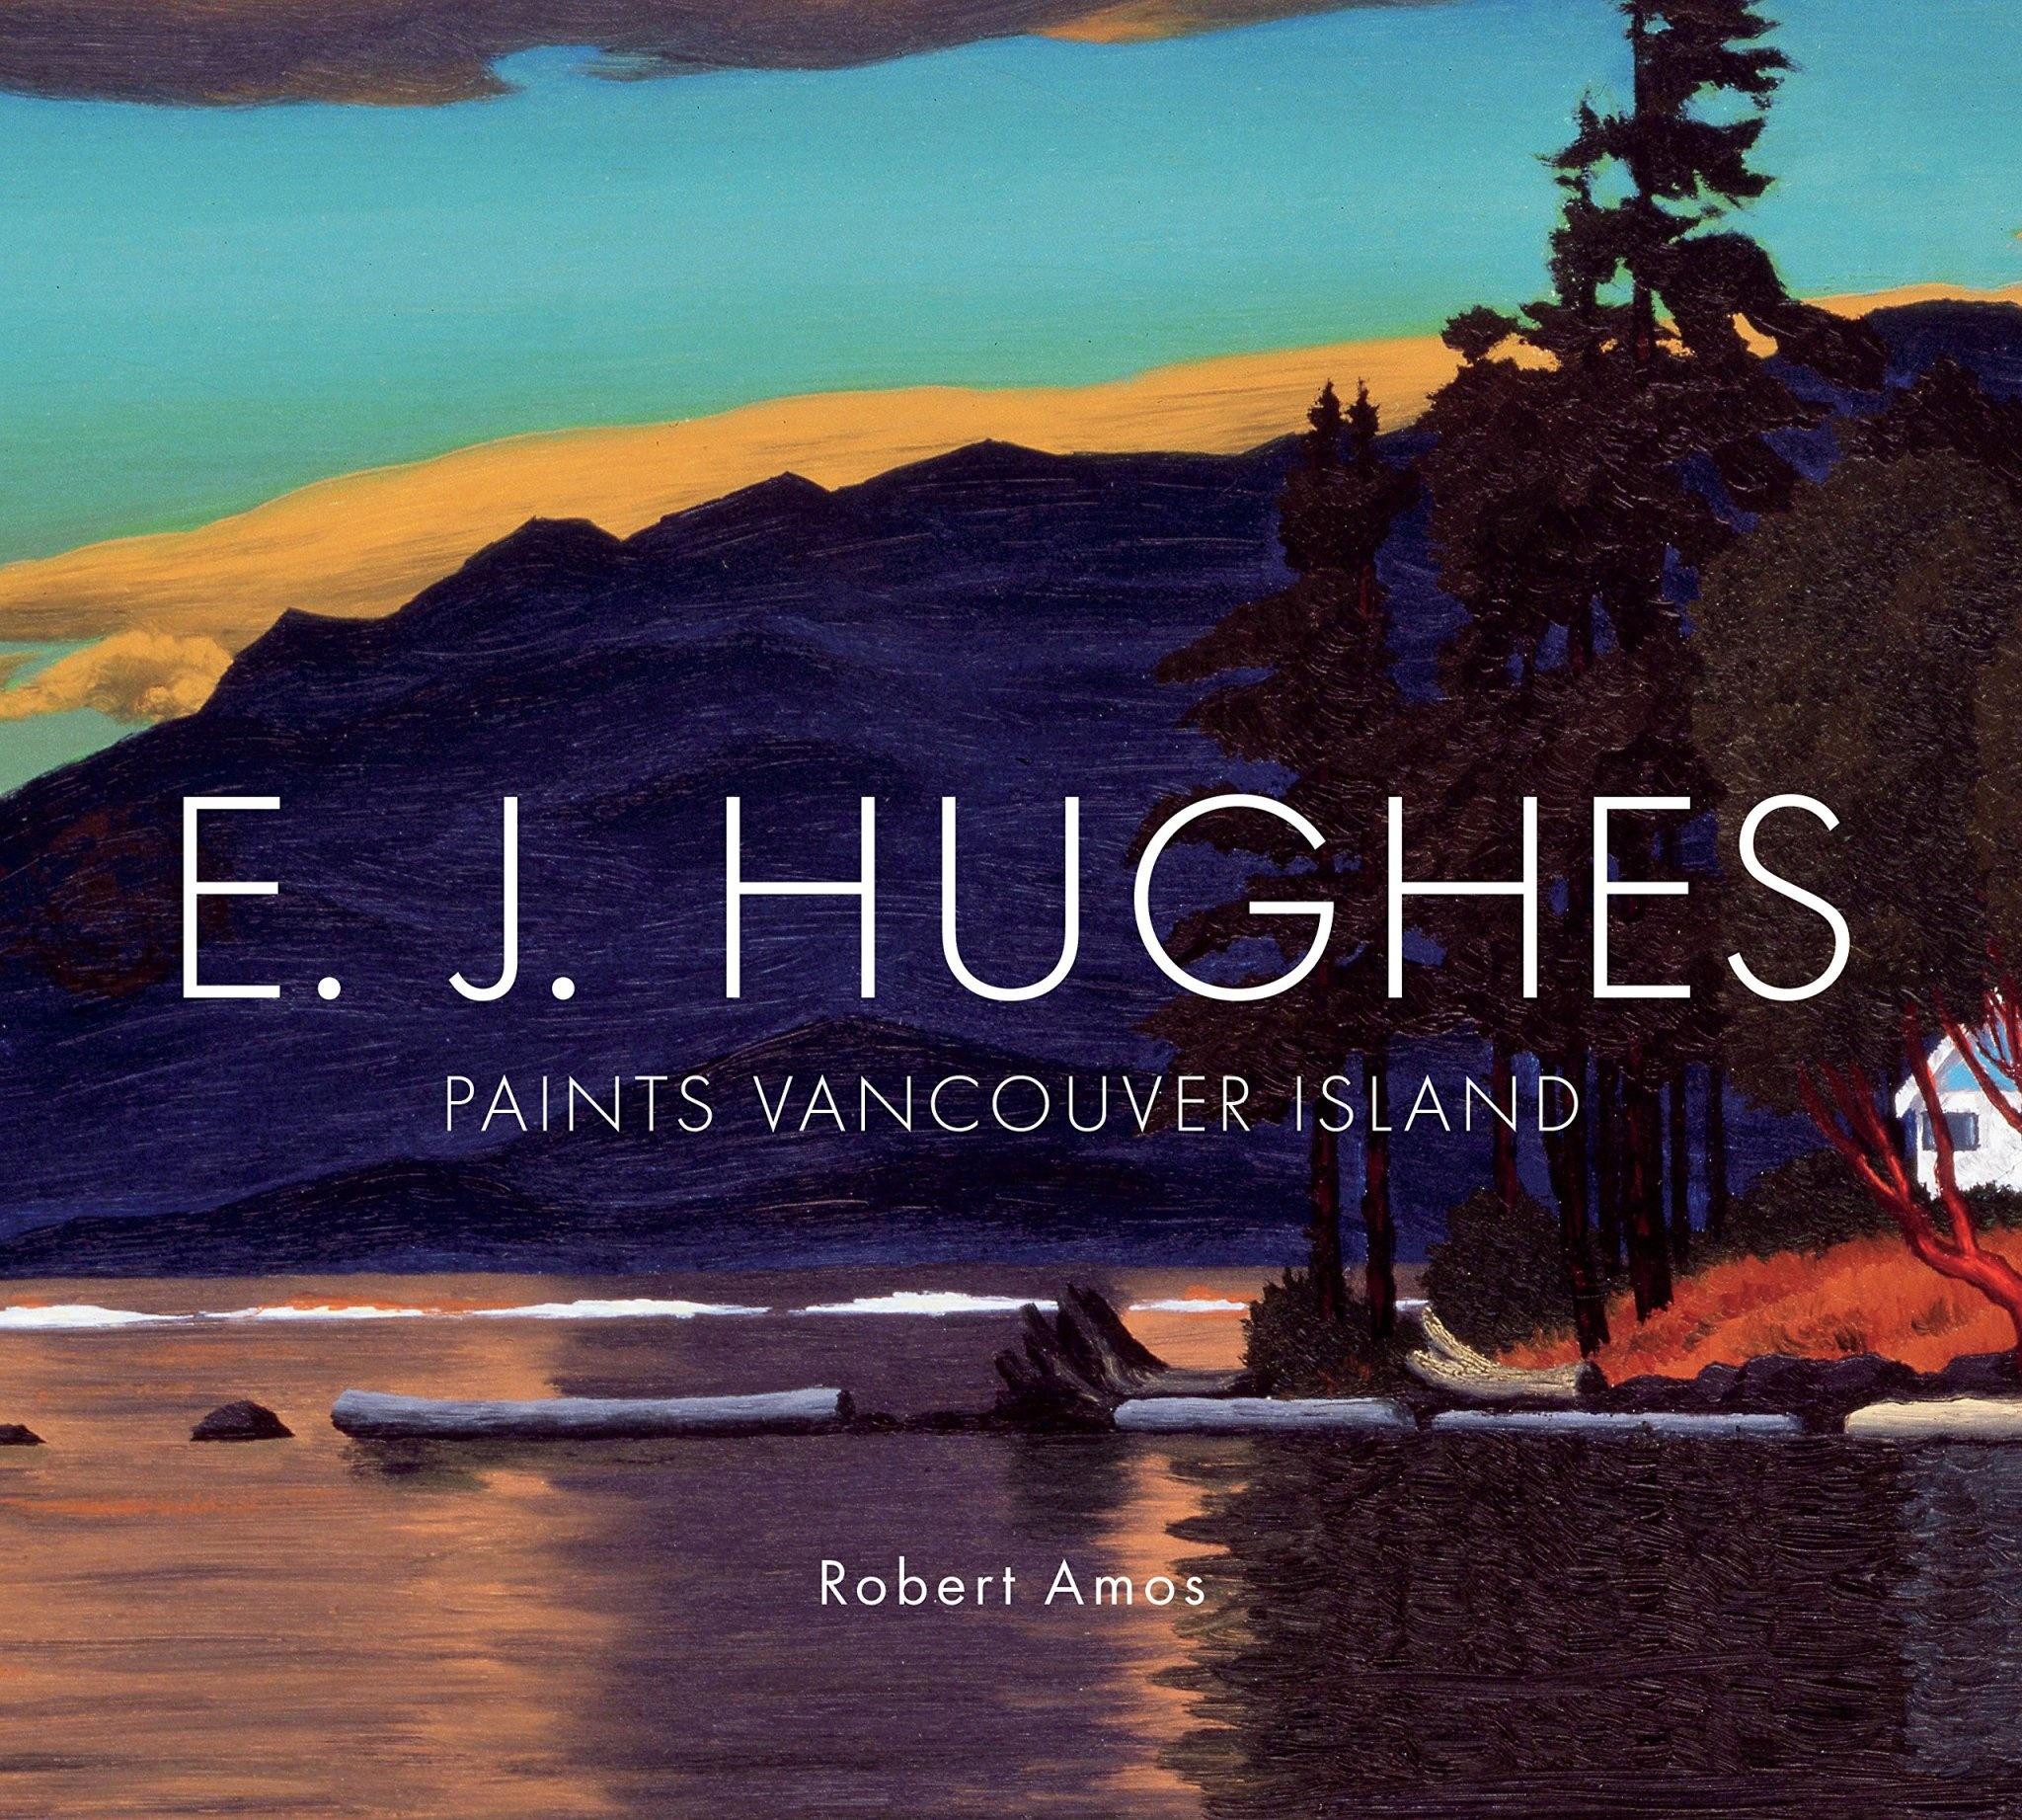 E.J. Hughes Paints Vancouver Island